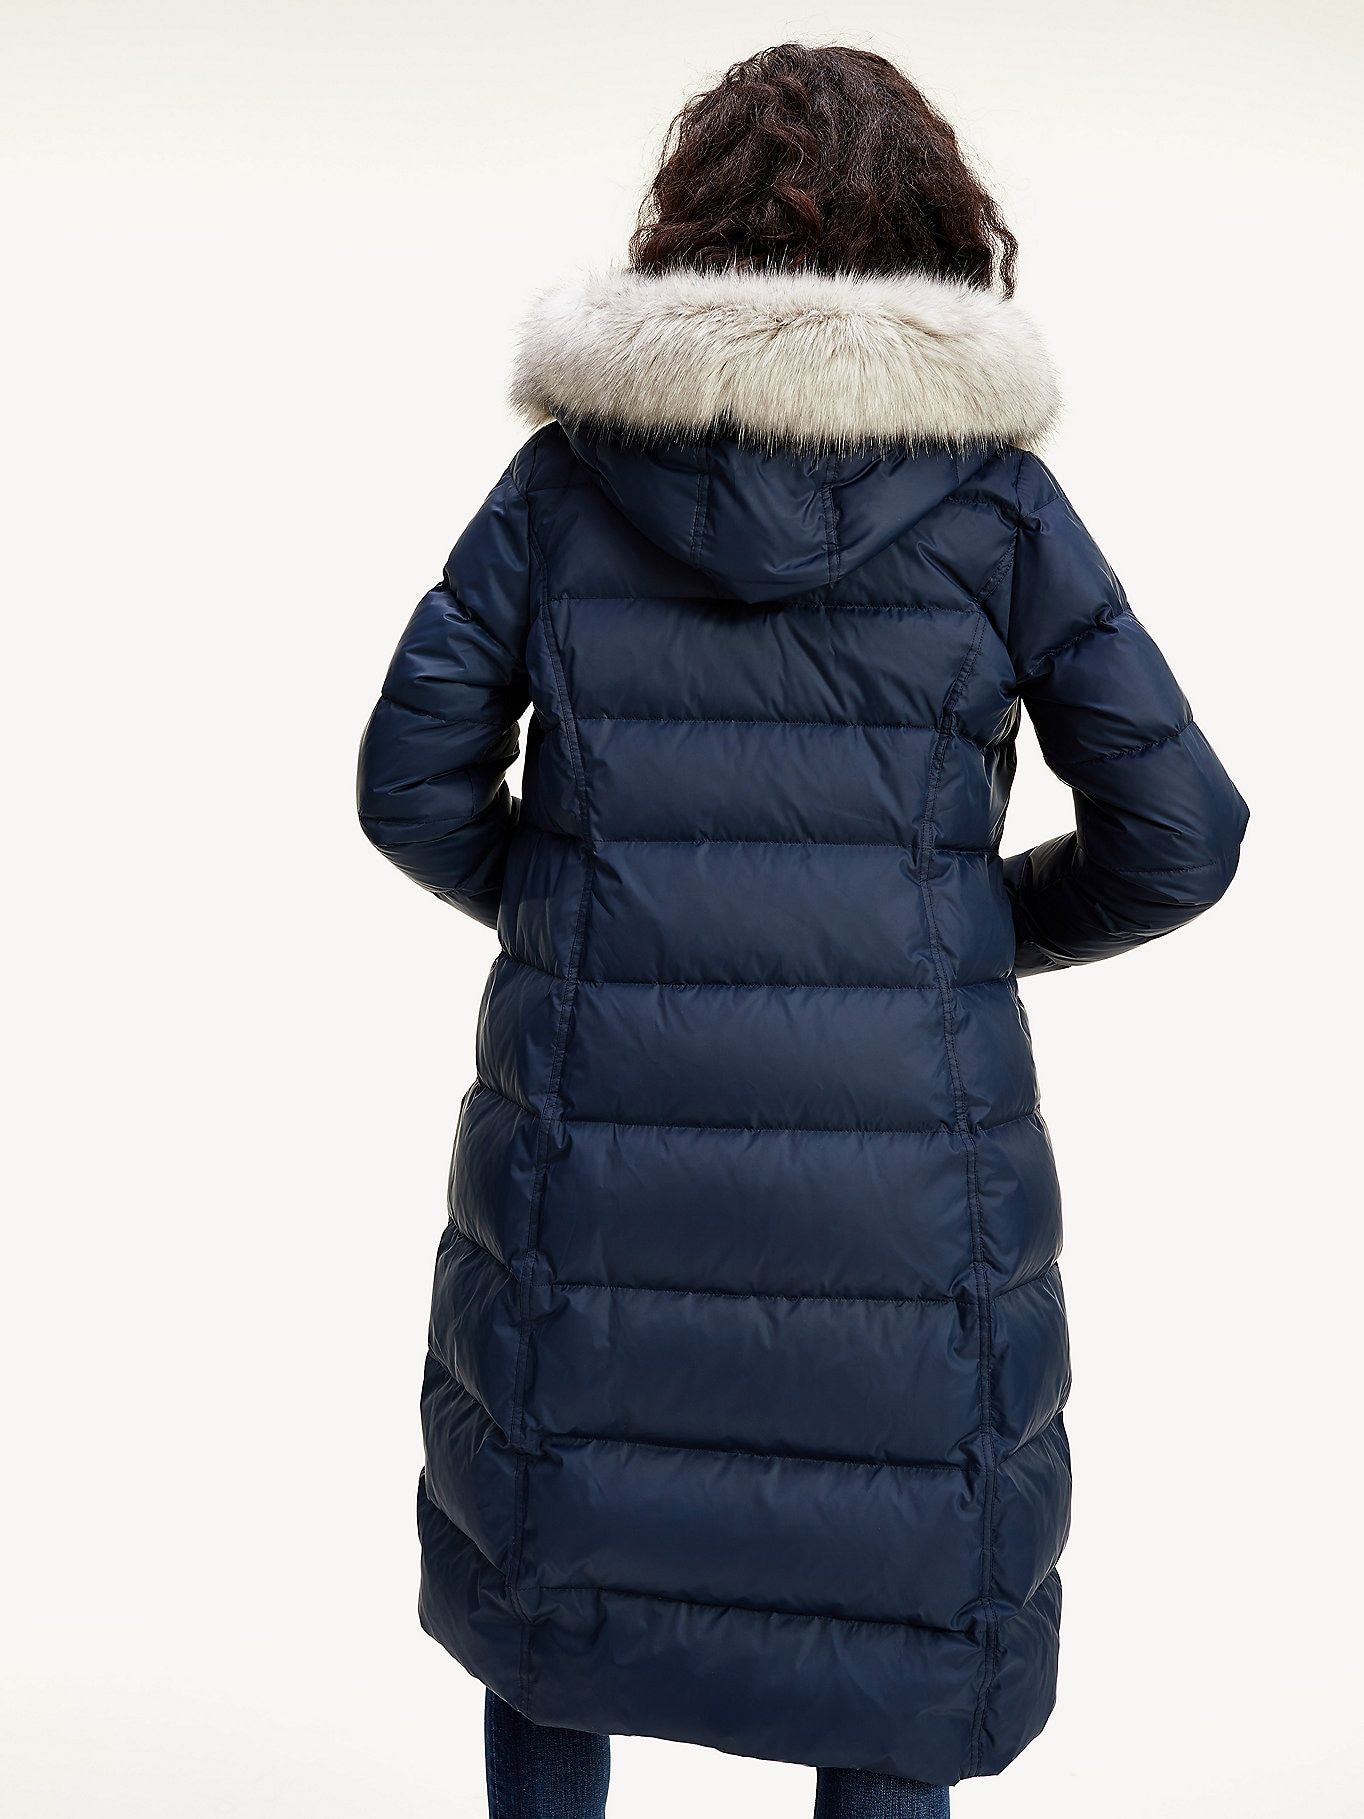 Essential Down Filled Maxi Coat Black Tommy Hilfiger In 2021 Maxi Coat Tommy Hilfiger Outerwear Jackets [ 1819 x 1364 Pixel ]